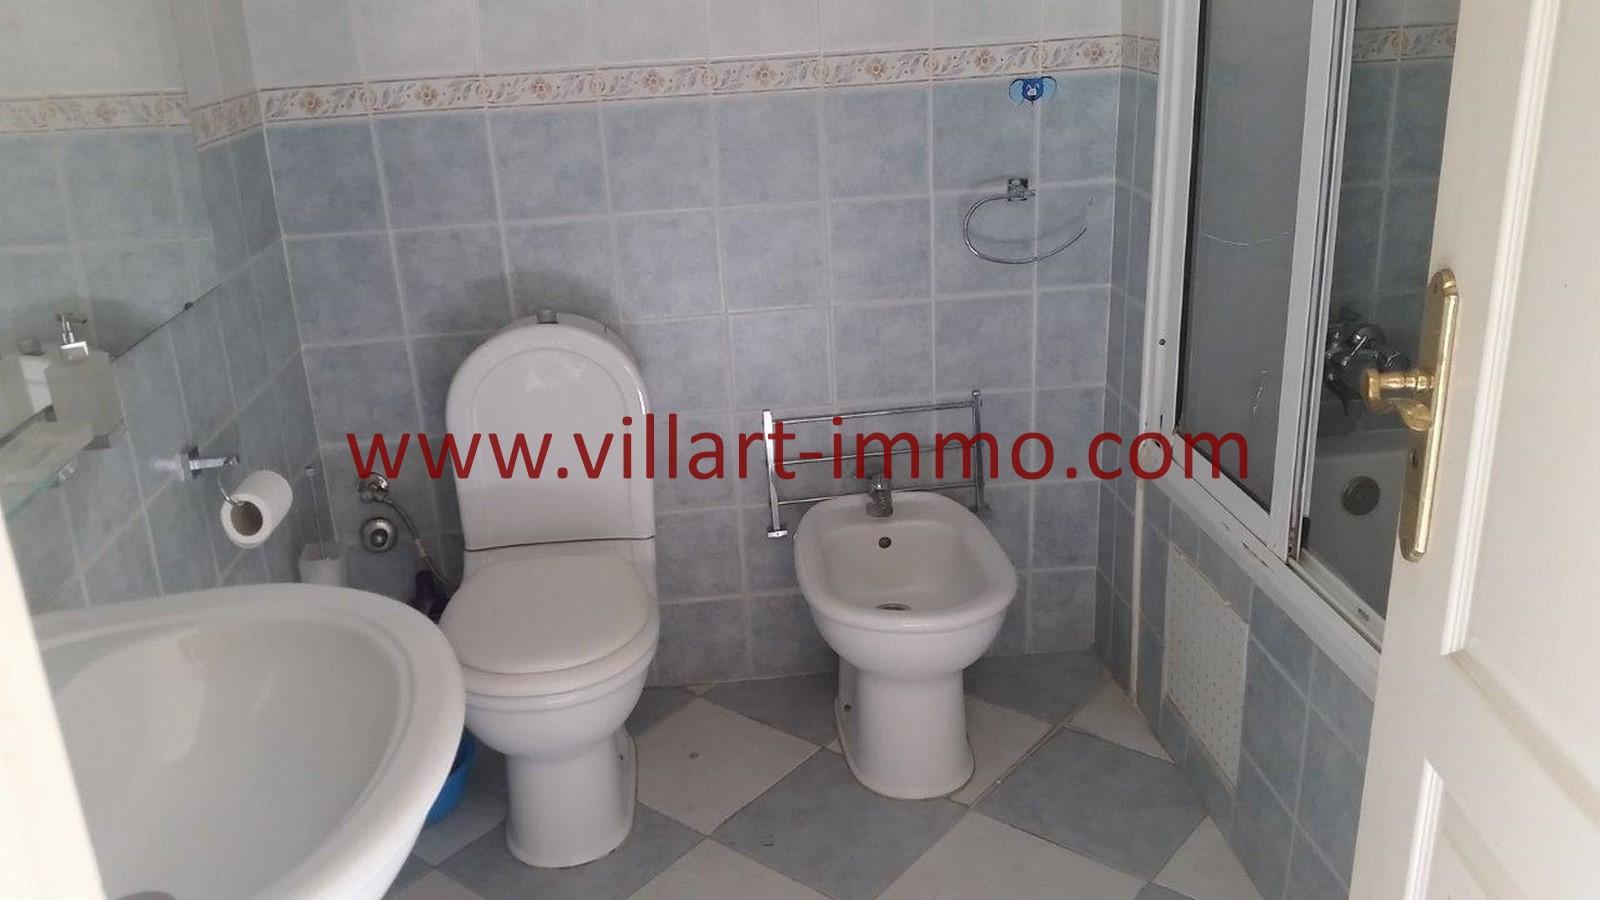 7-location-appartement-meubles-tanger-iberia-salle-de-bain-l1012-villart-immo-maroc